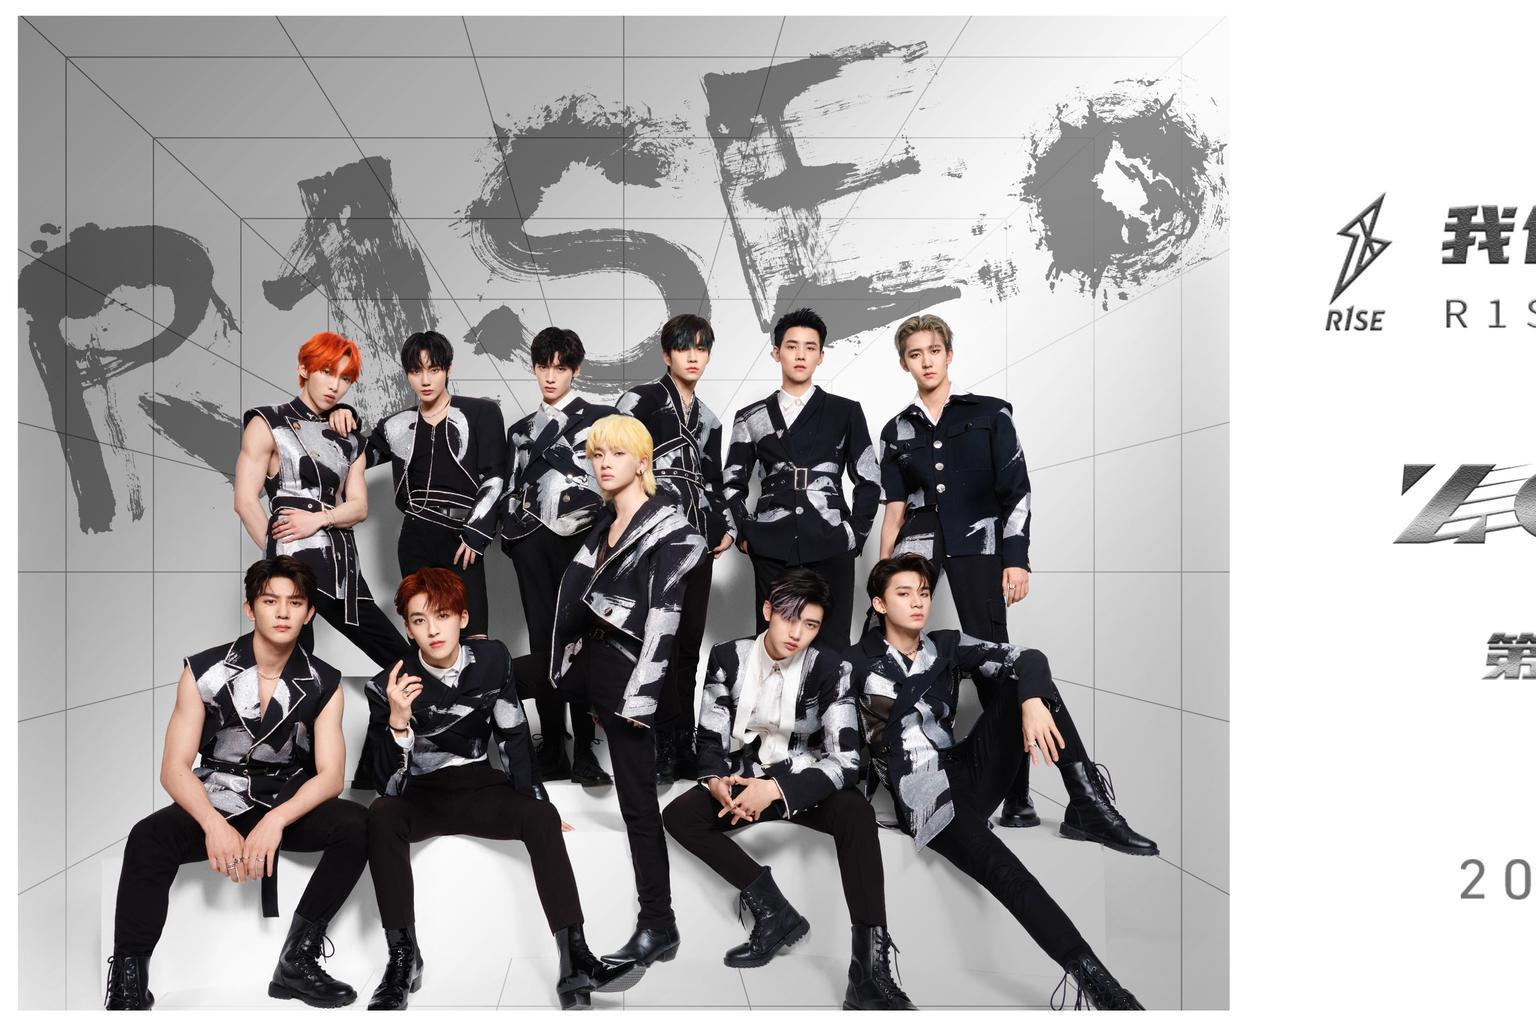 R1SE告别限定专辑上线 第一主打曲《ZOOM》开启毕业乐章